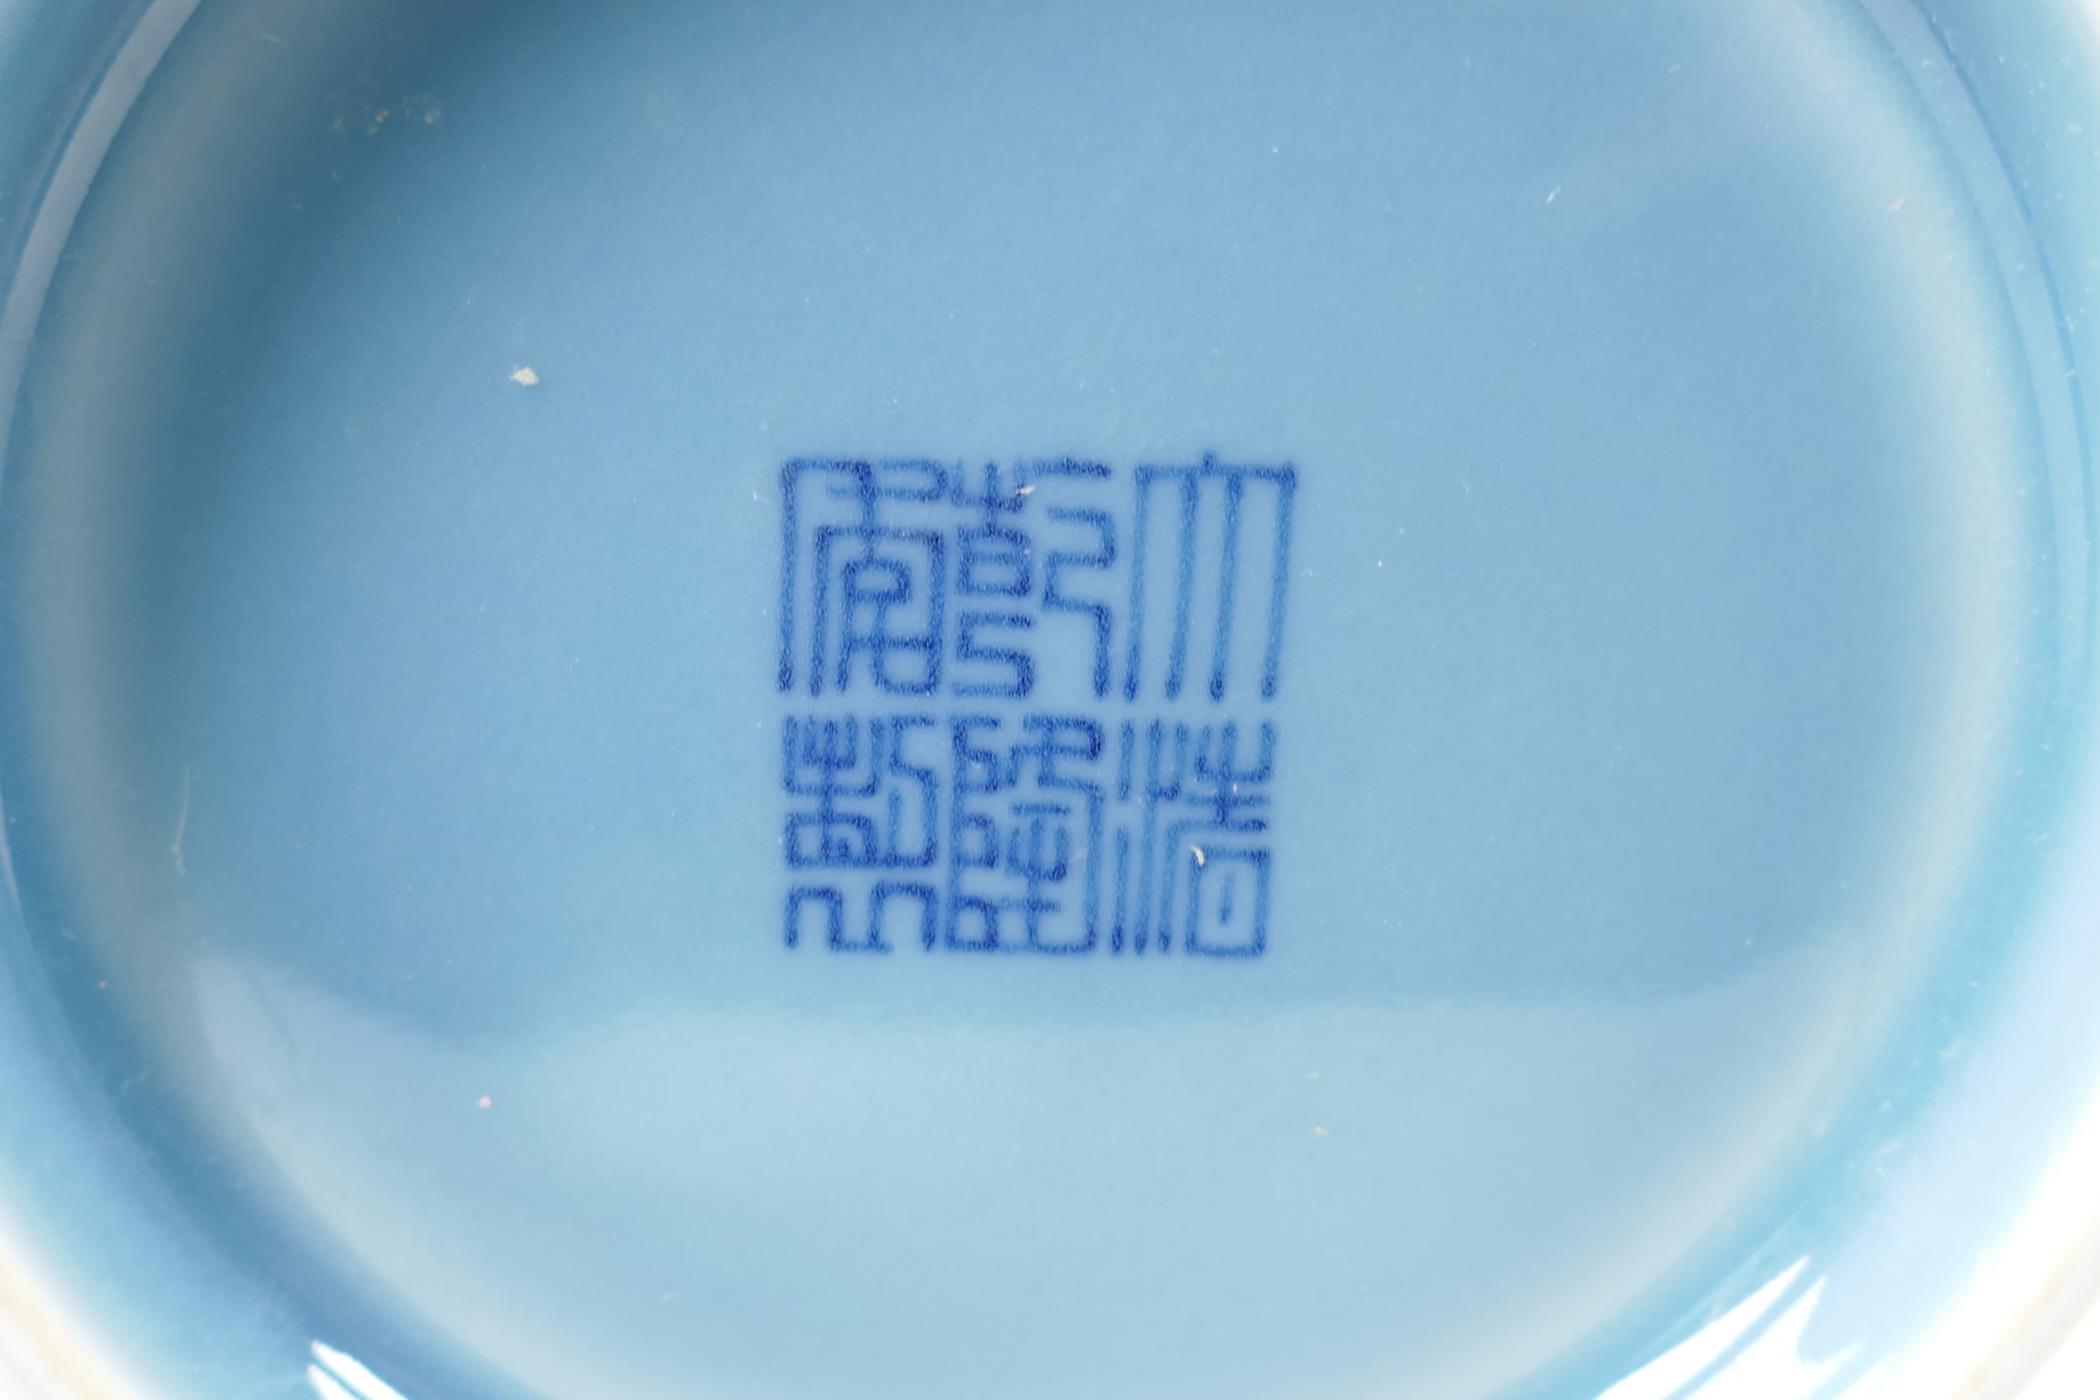 "A Chinese blue glazed porcelain vase with underglaze floral decoration, seal mark to base, 11"" high - Image 4 of 4"